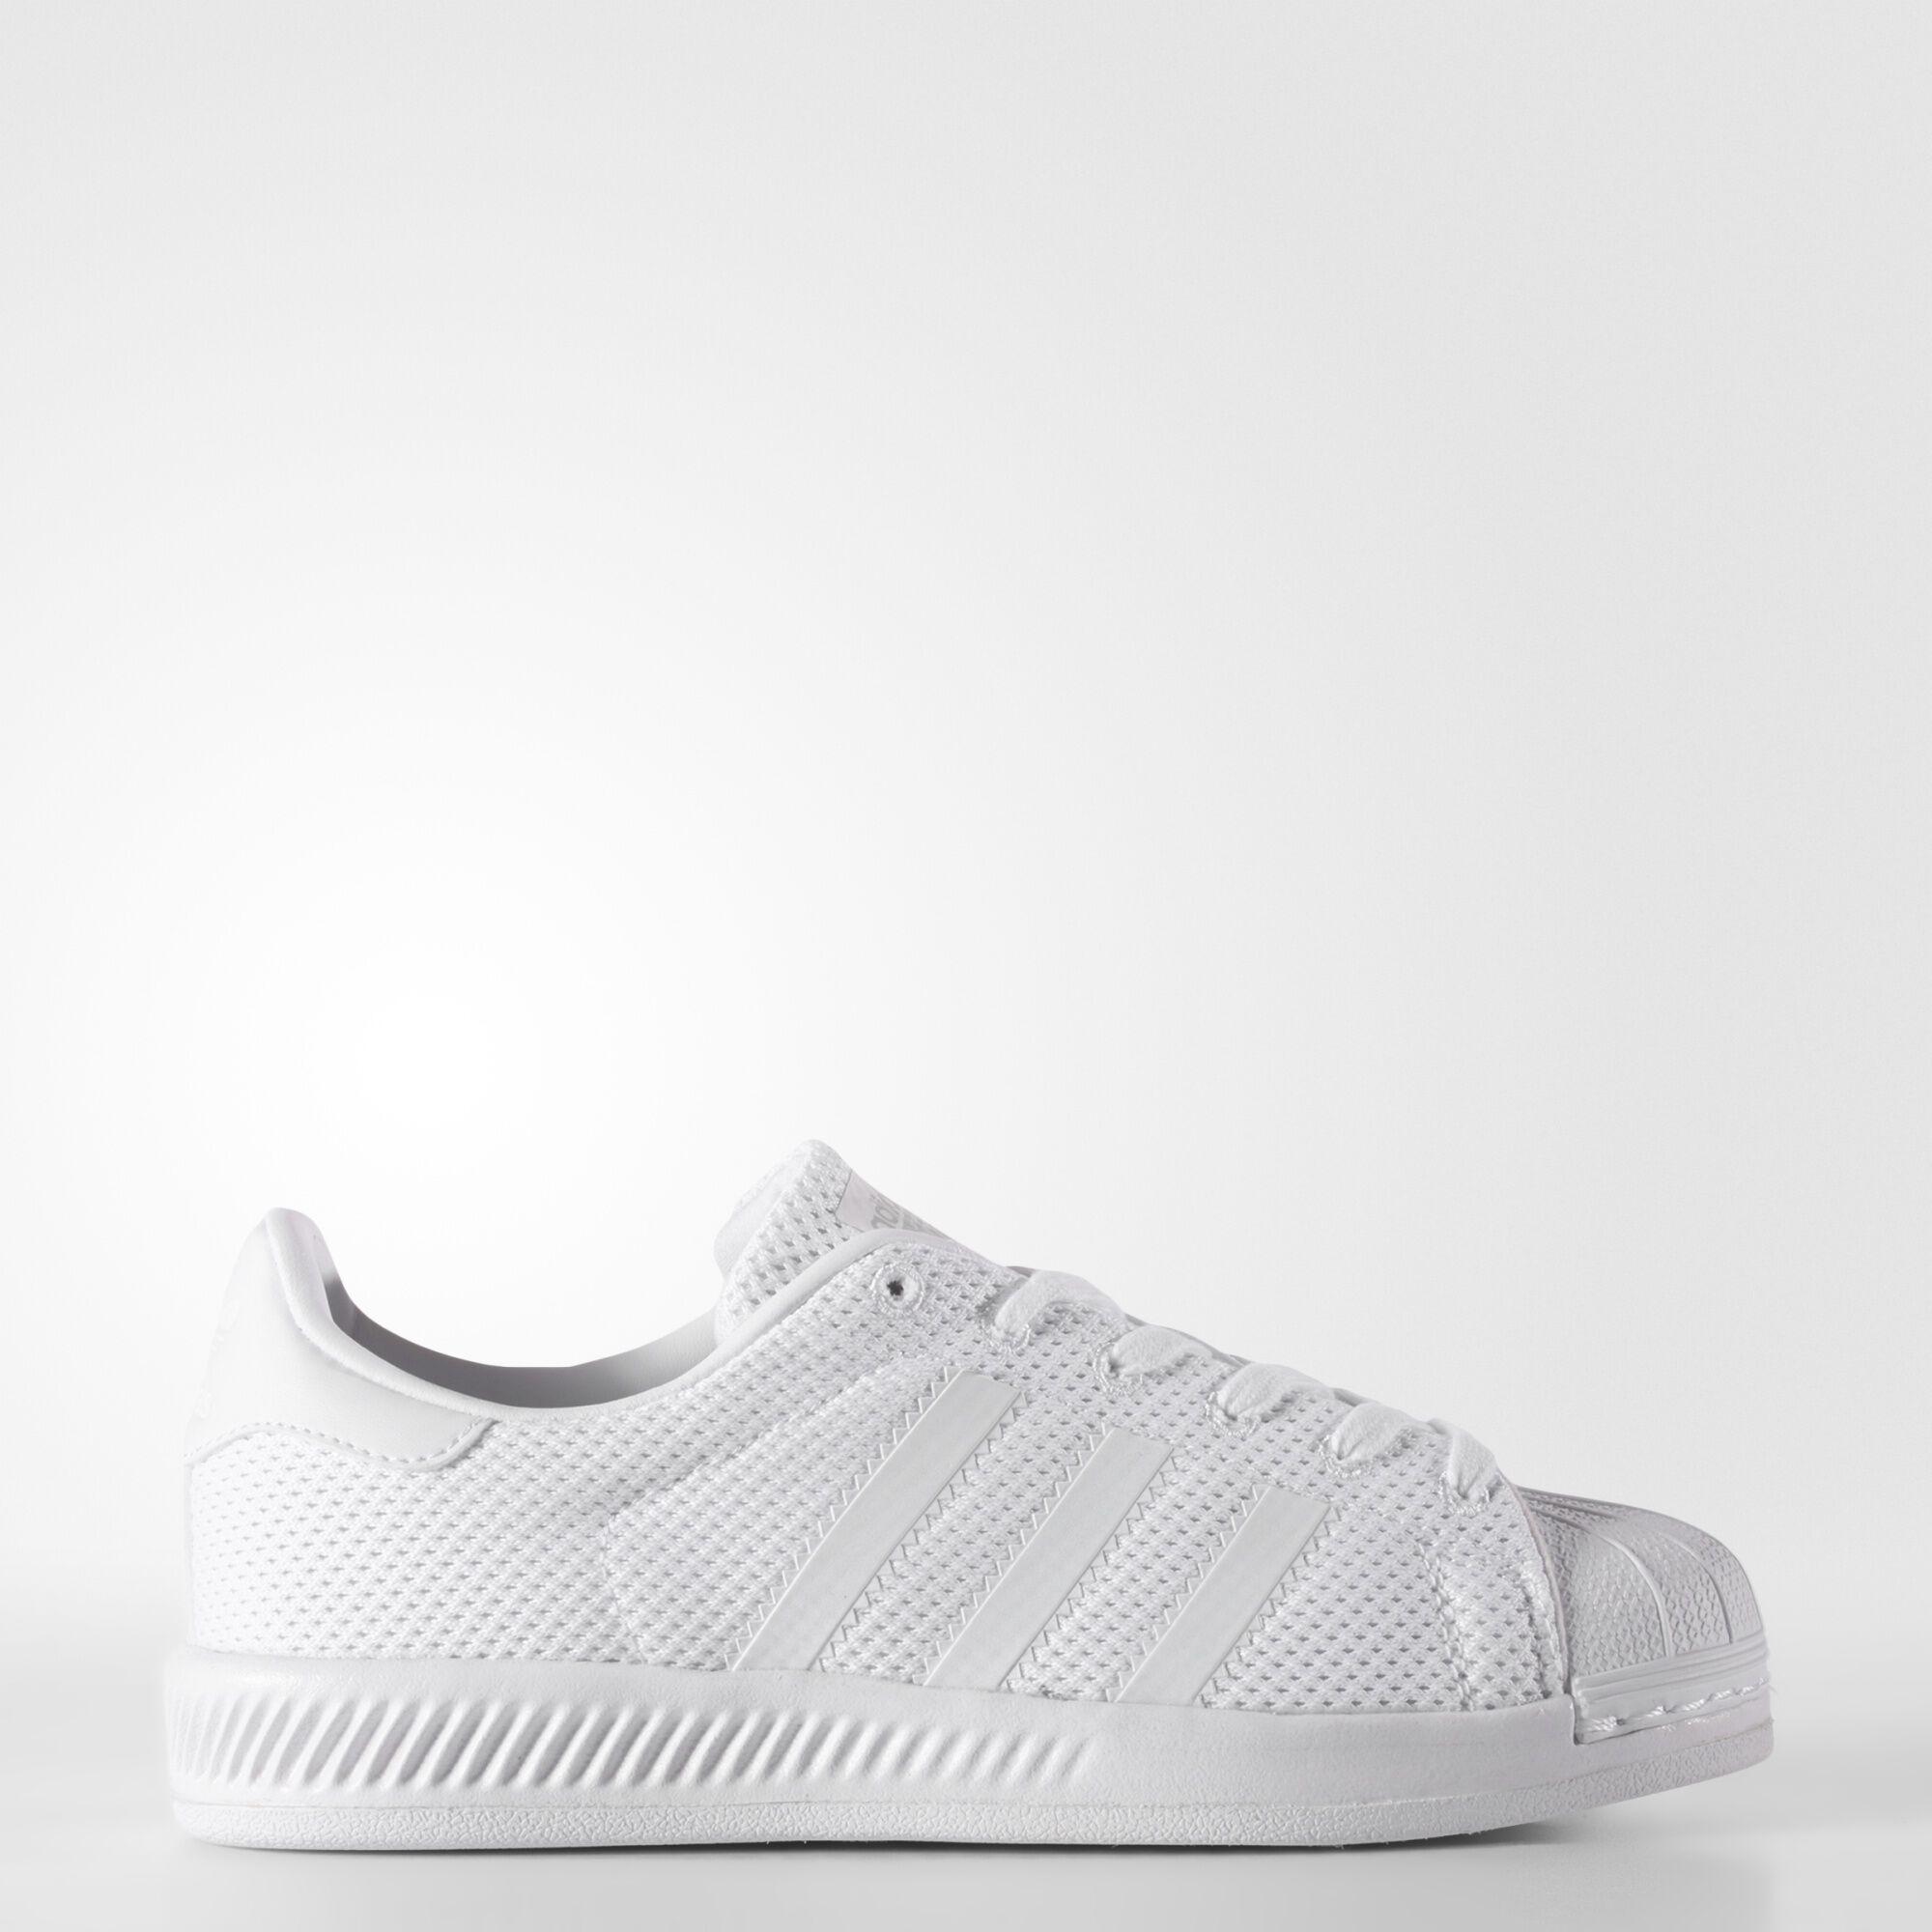 adidas Originals Superstar Foundation White Sneakers B27136